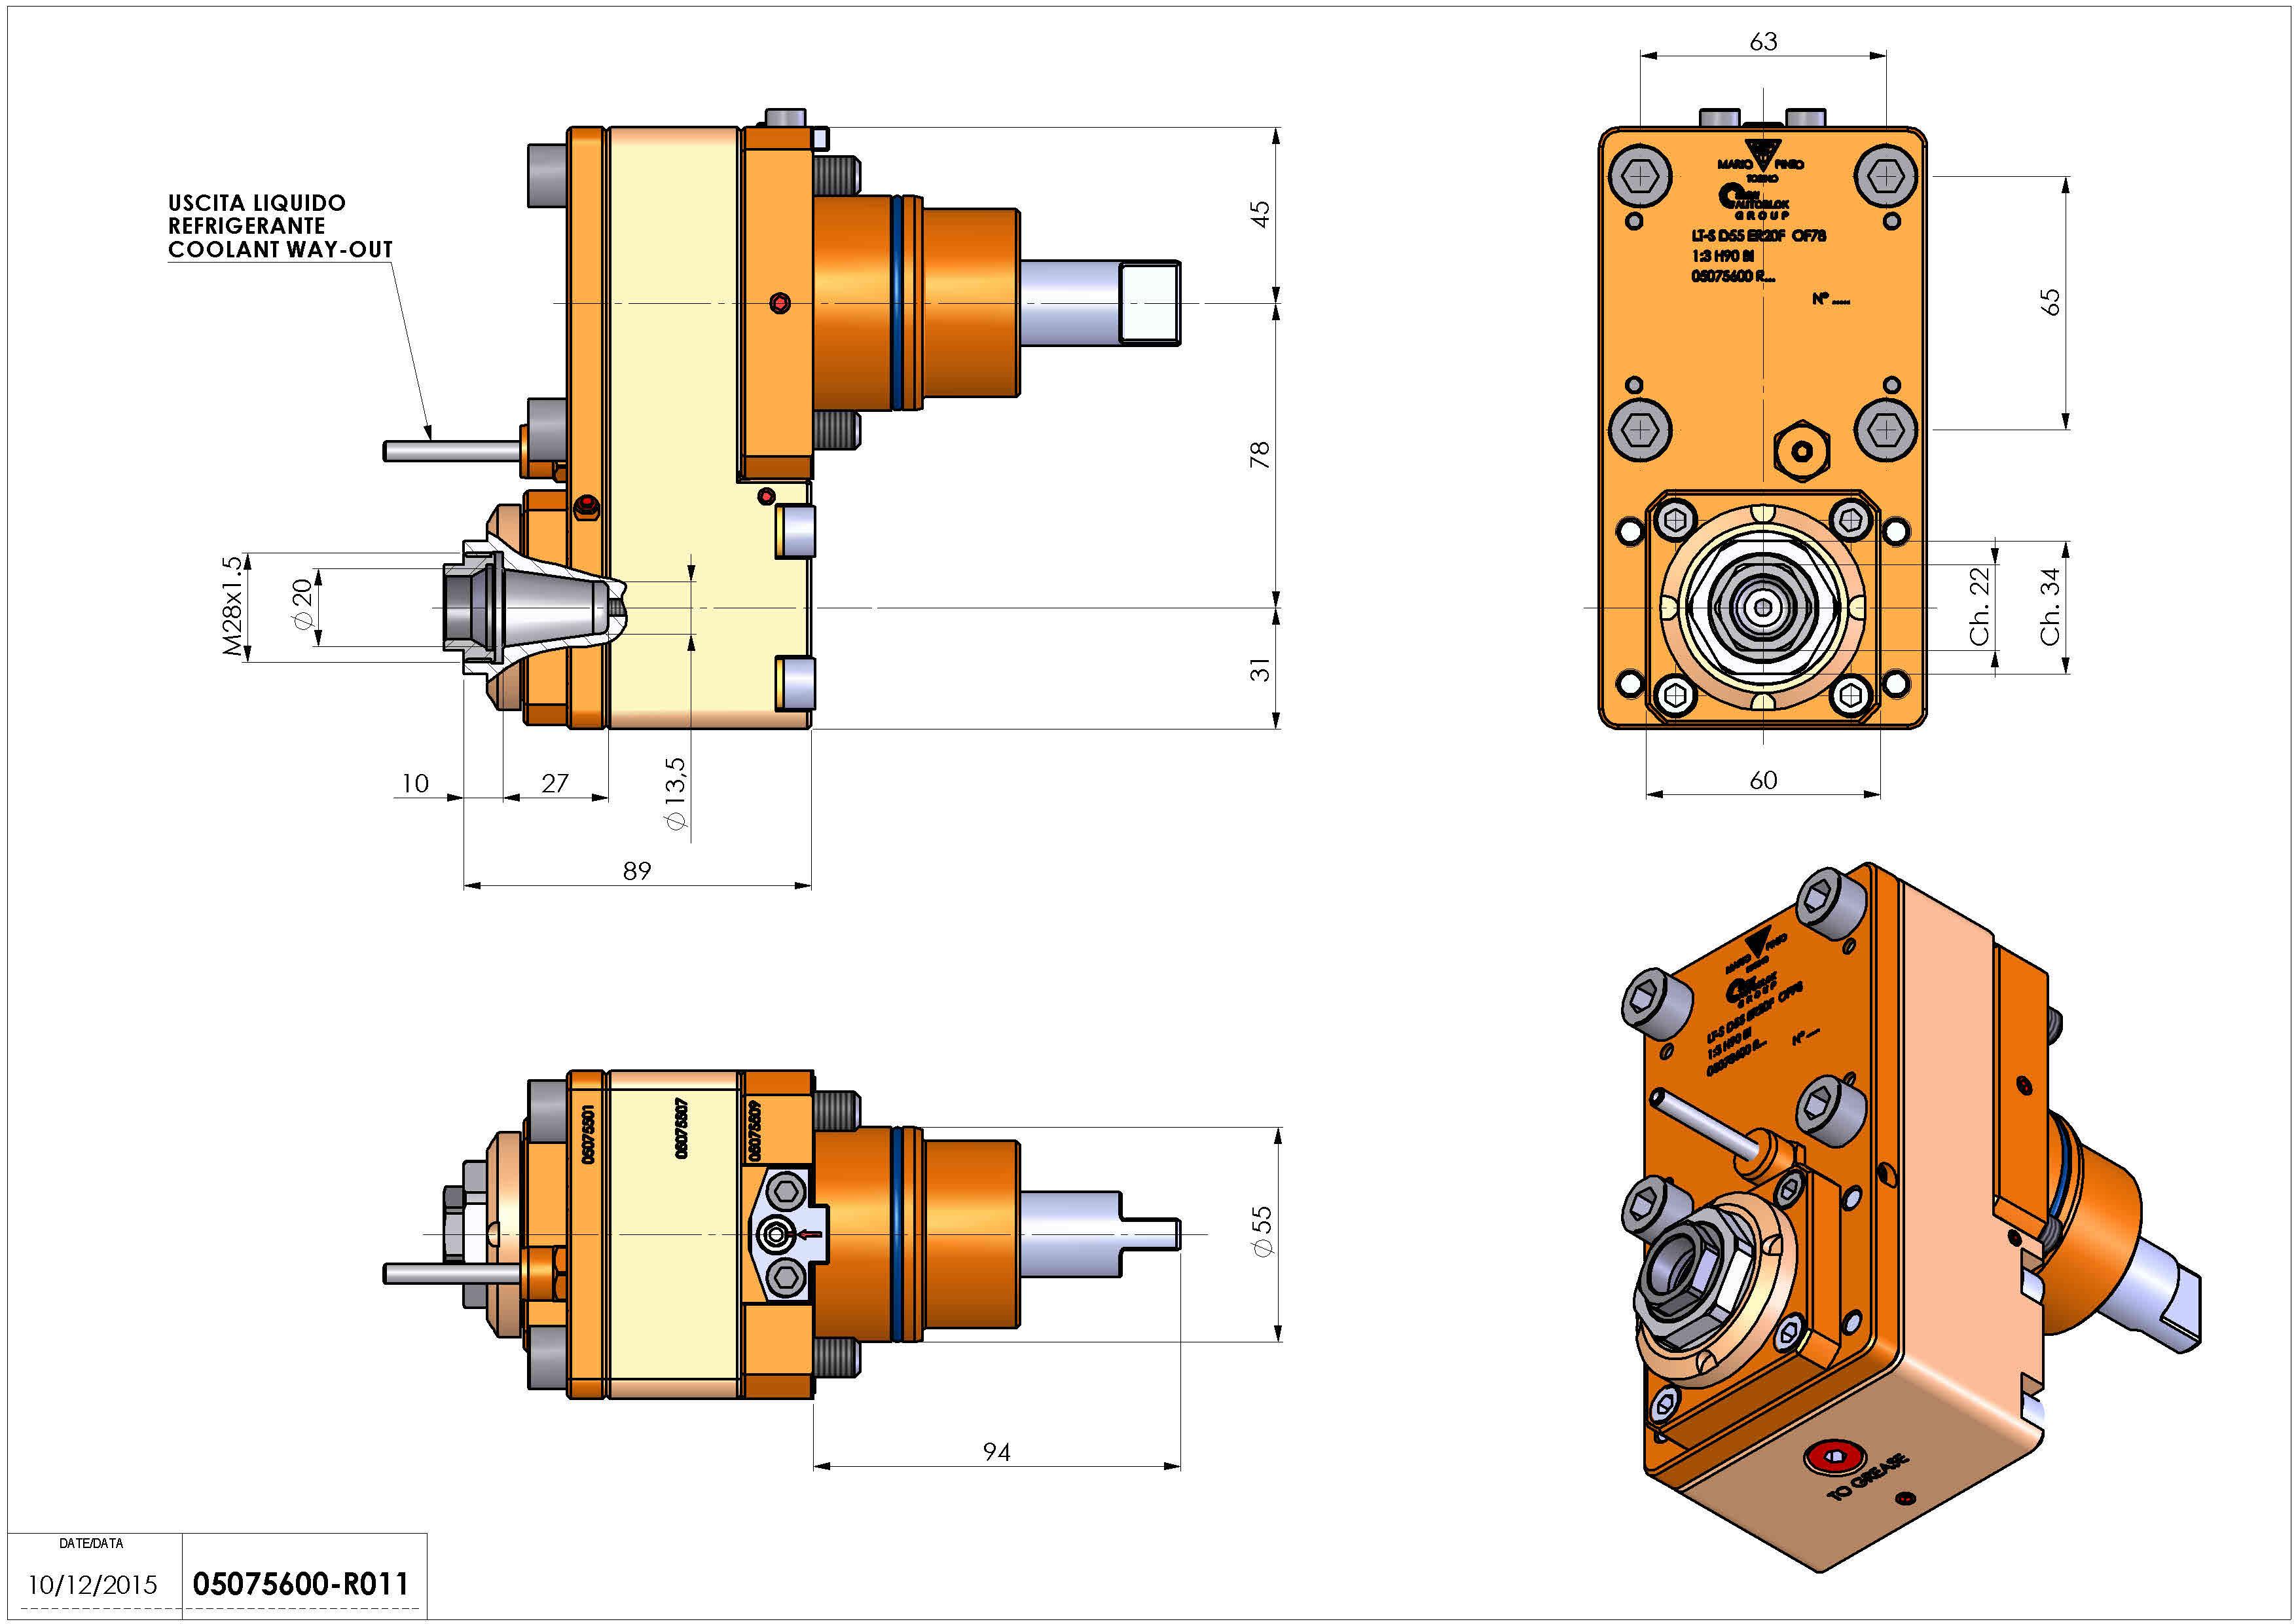 Technical image - LT-S D55 ER20F OF78 1:3 H90 BI.